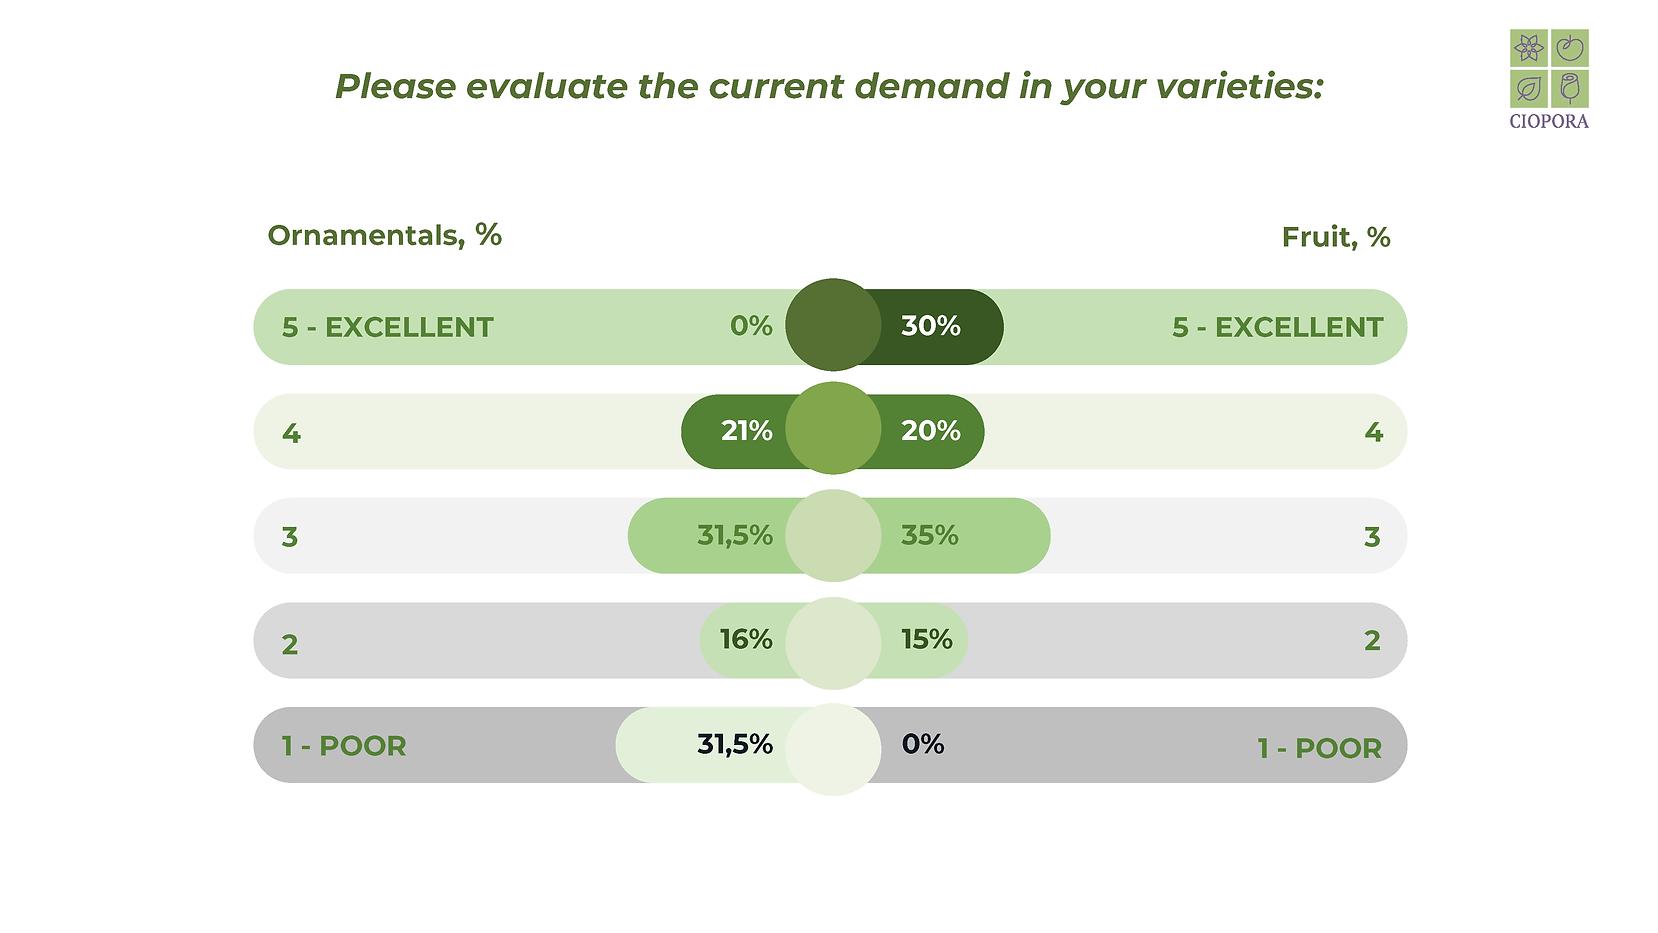 Current demand in varieties (first half of April 2020)